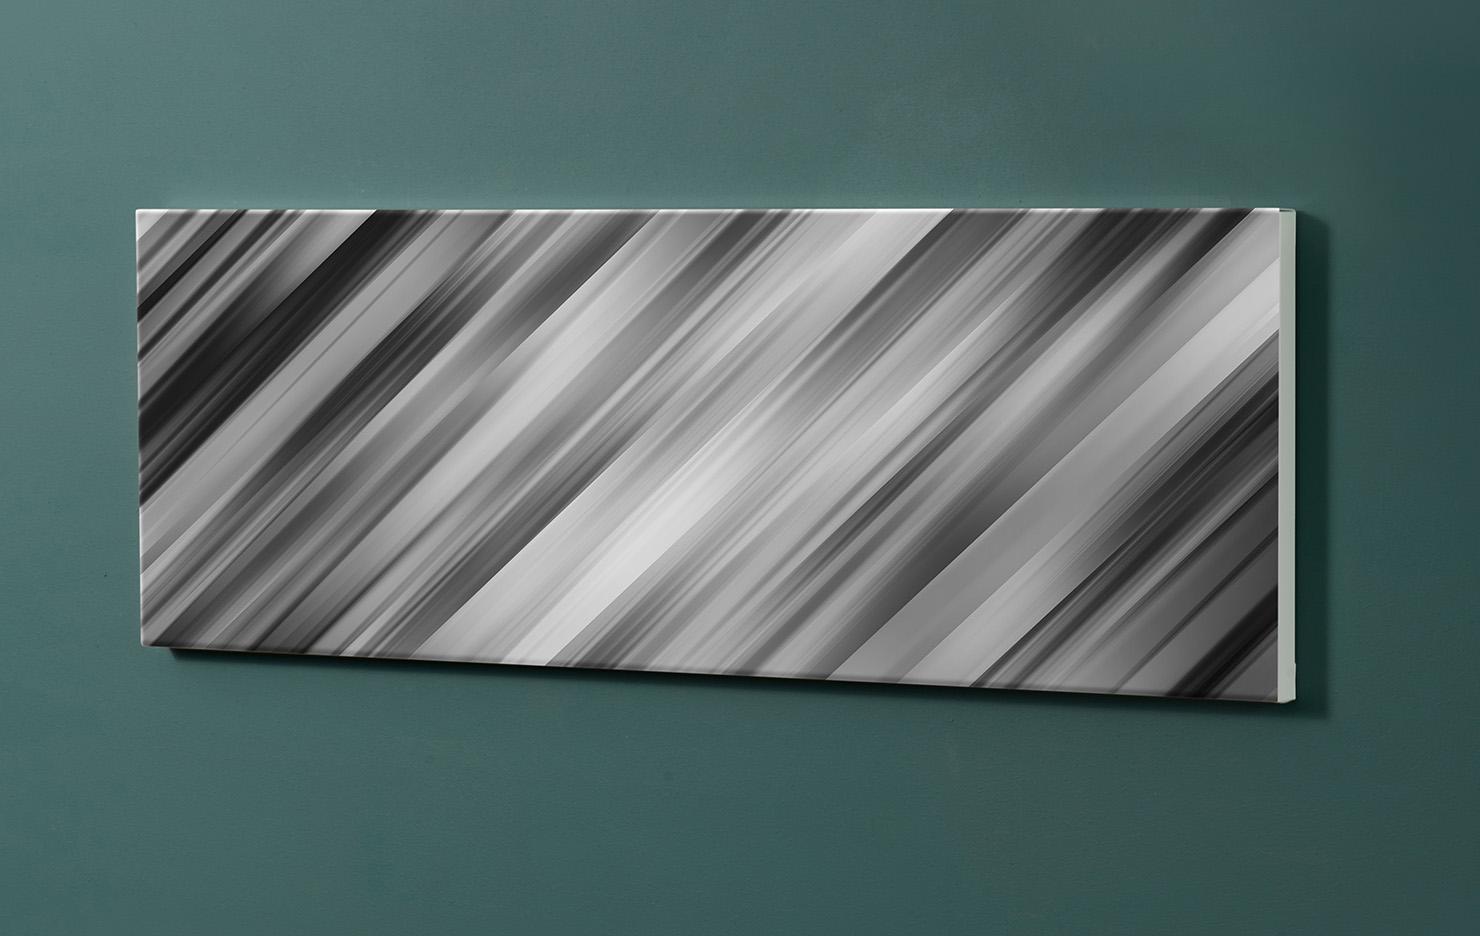 Magnettafel NOTIZ 90x30cm Motiv-Pinnwand M124 Schwarz Muster